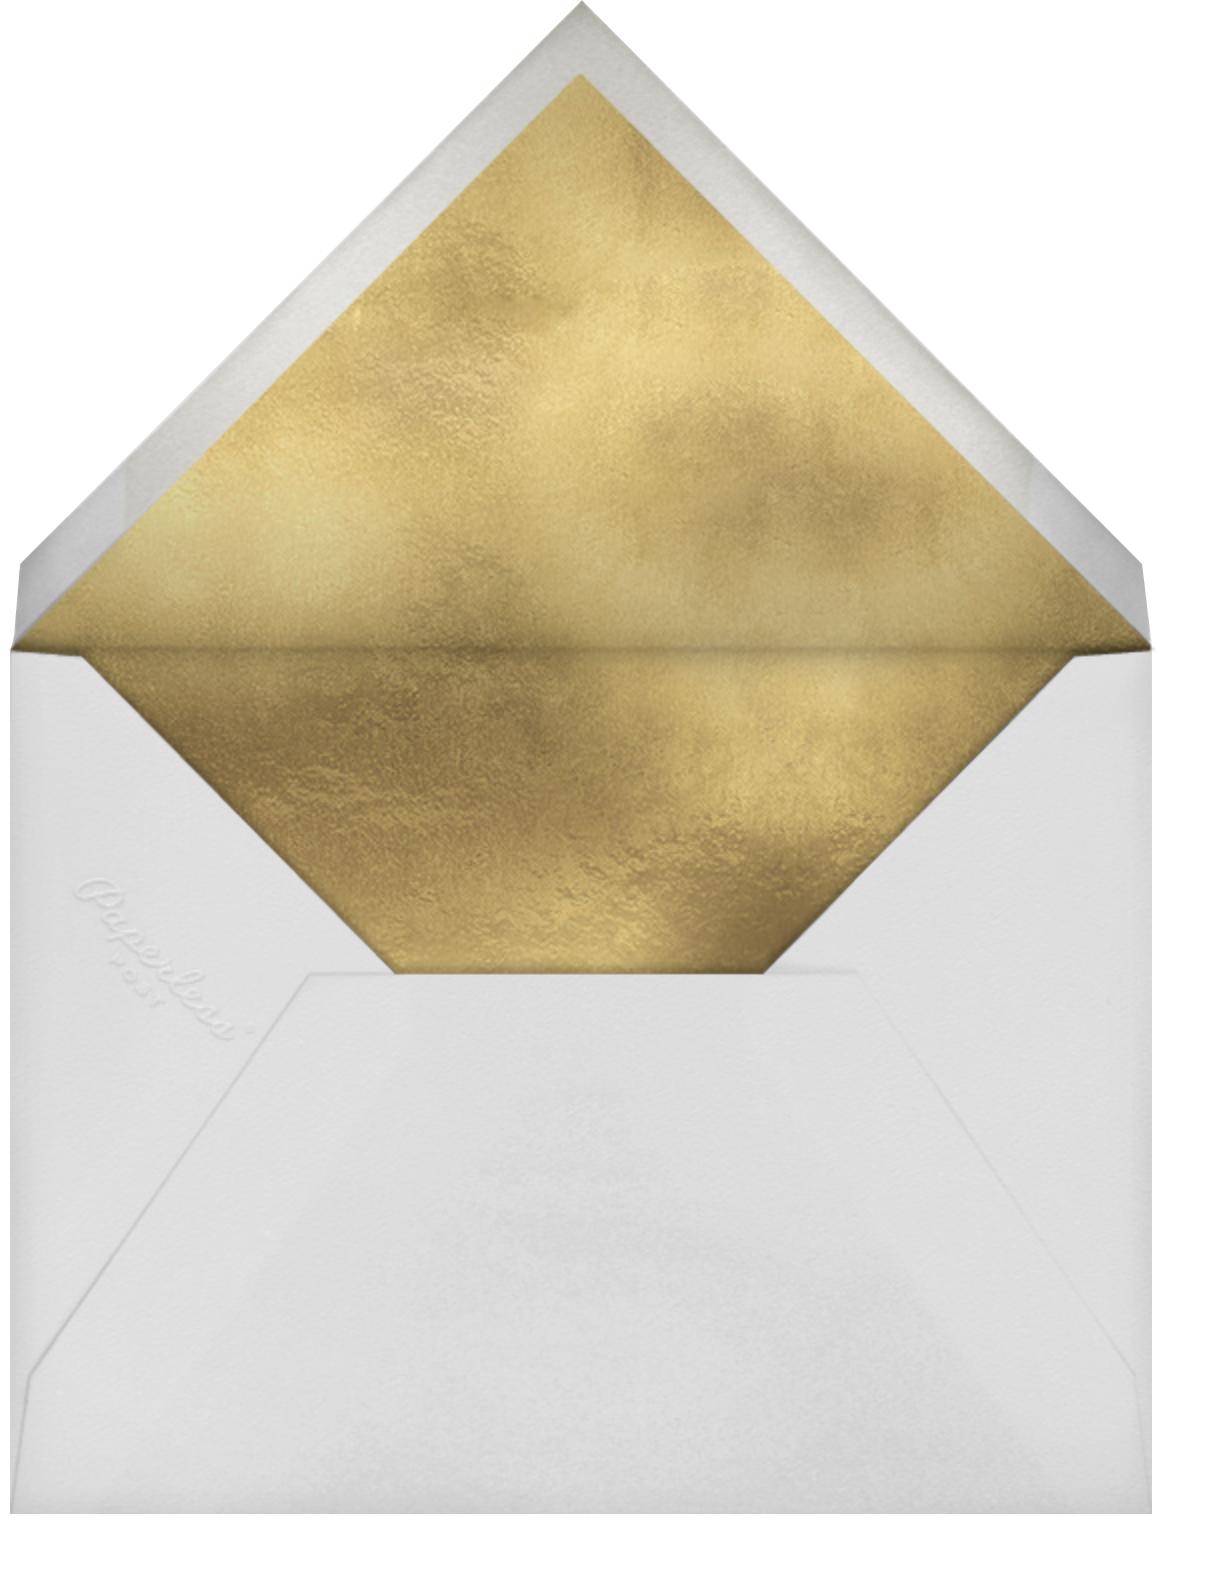 Evergreen Nativity - Rifle Paper Co. - Christmas - envelope back